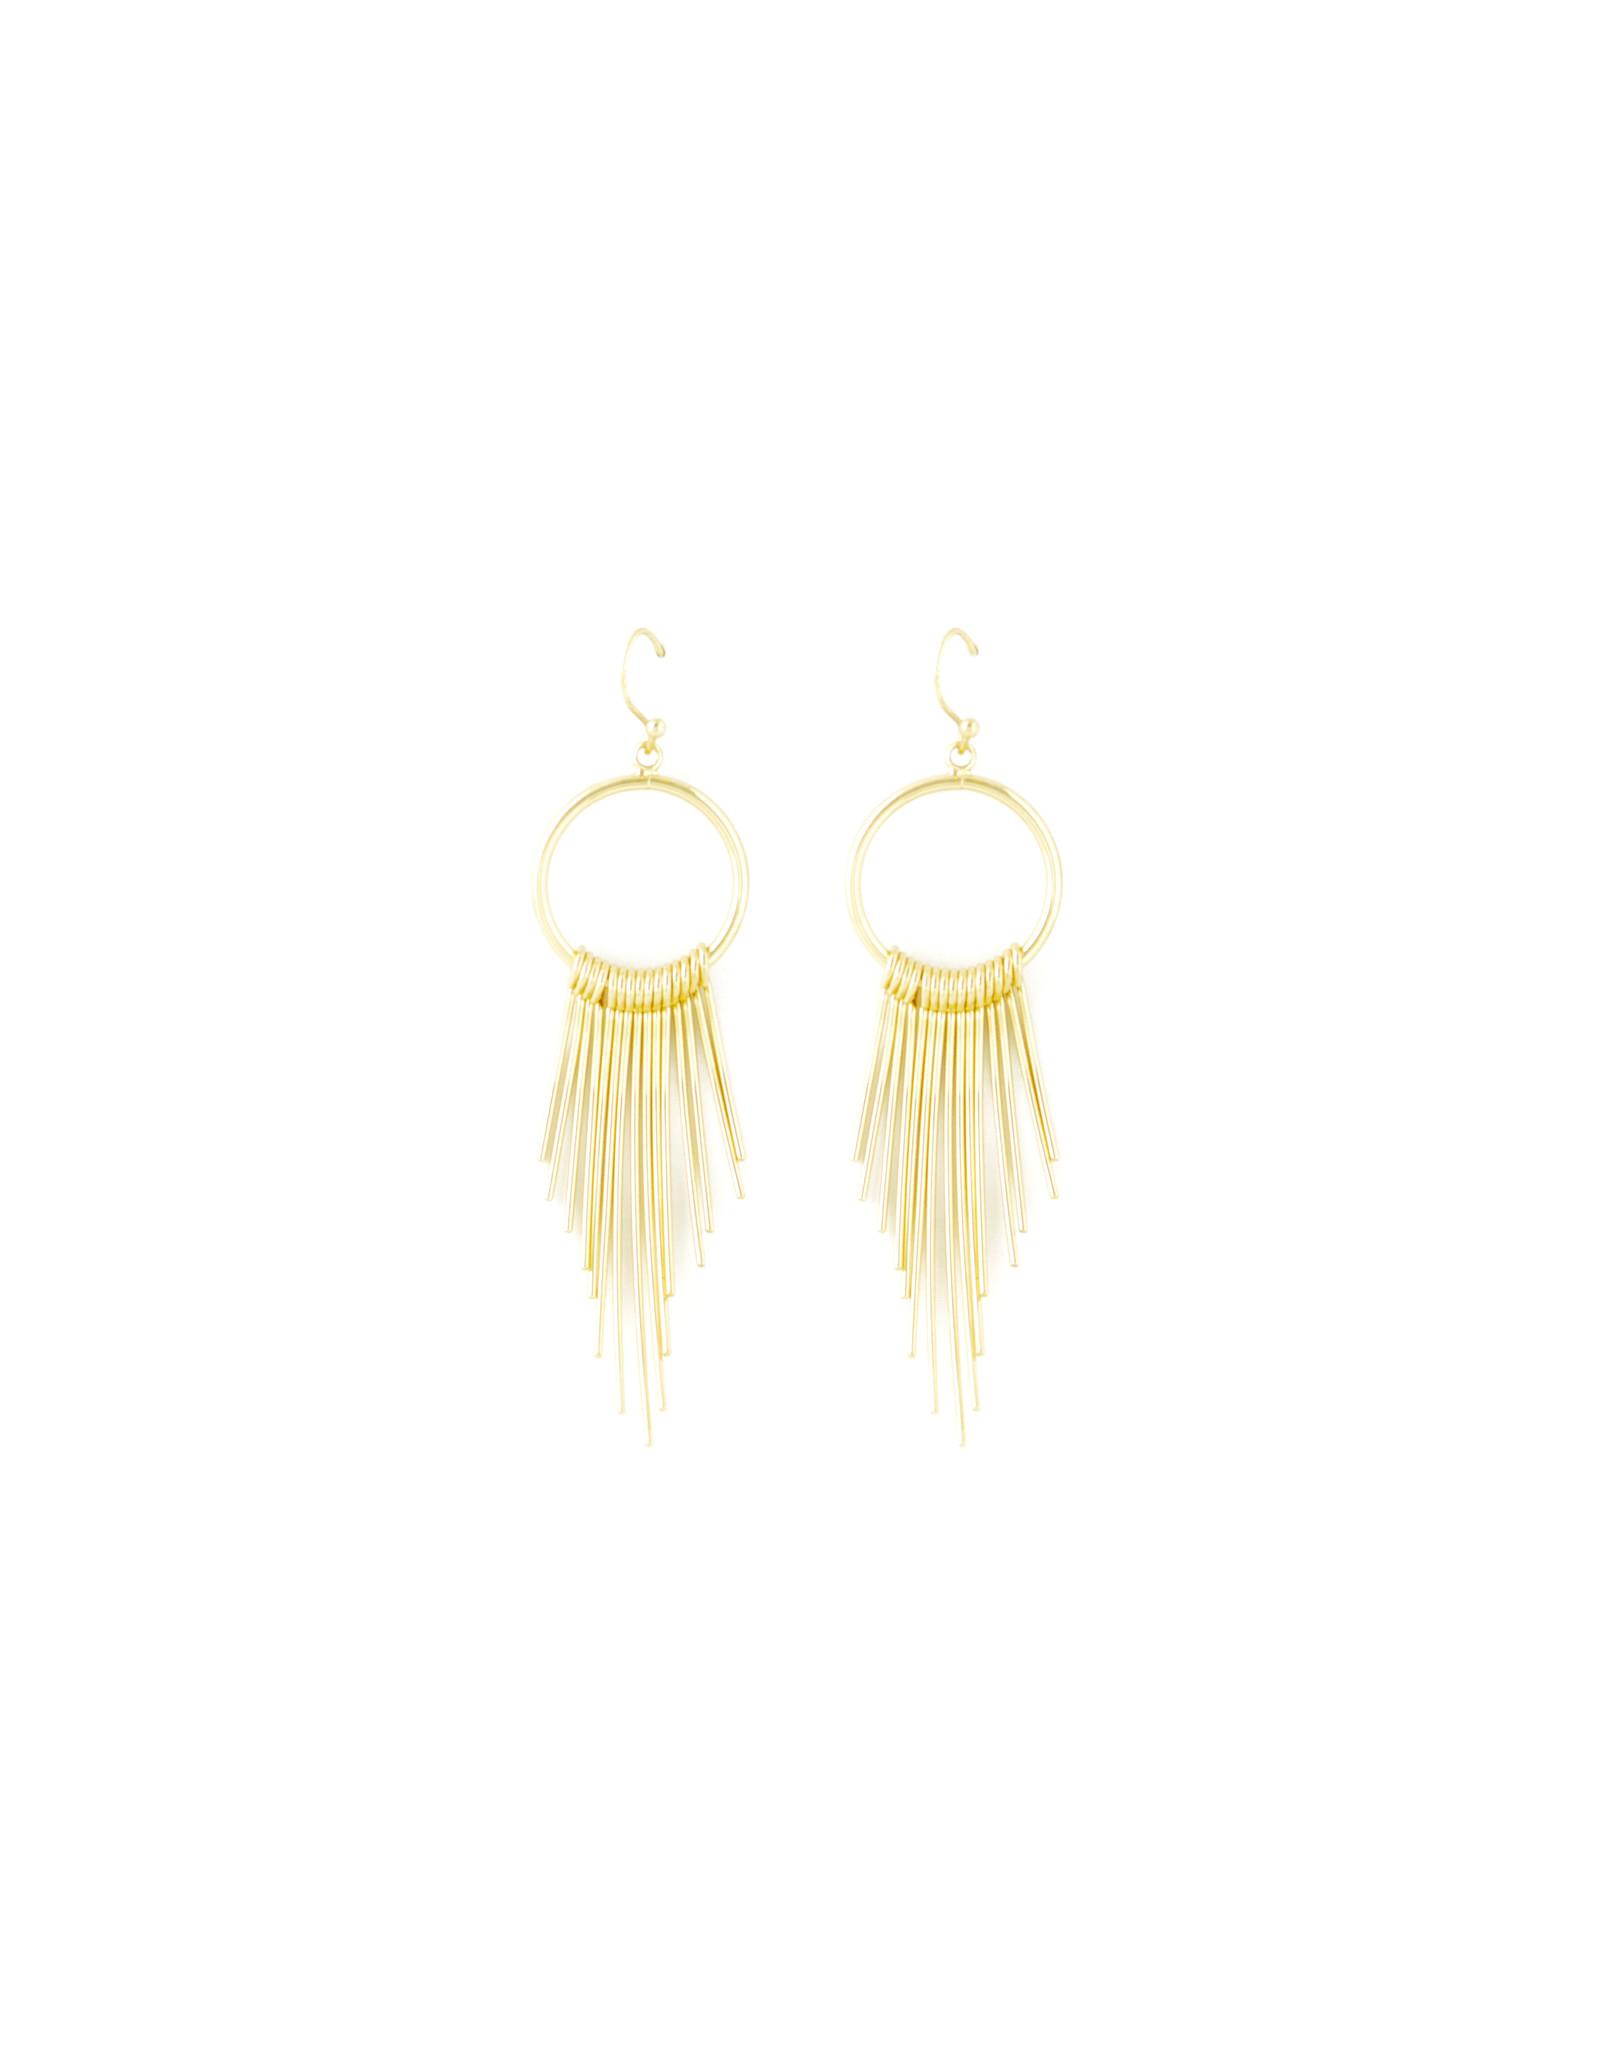 Splendid Iris E/R- Circle W/ Graduating Curves Gold